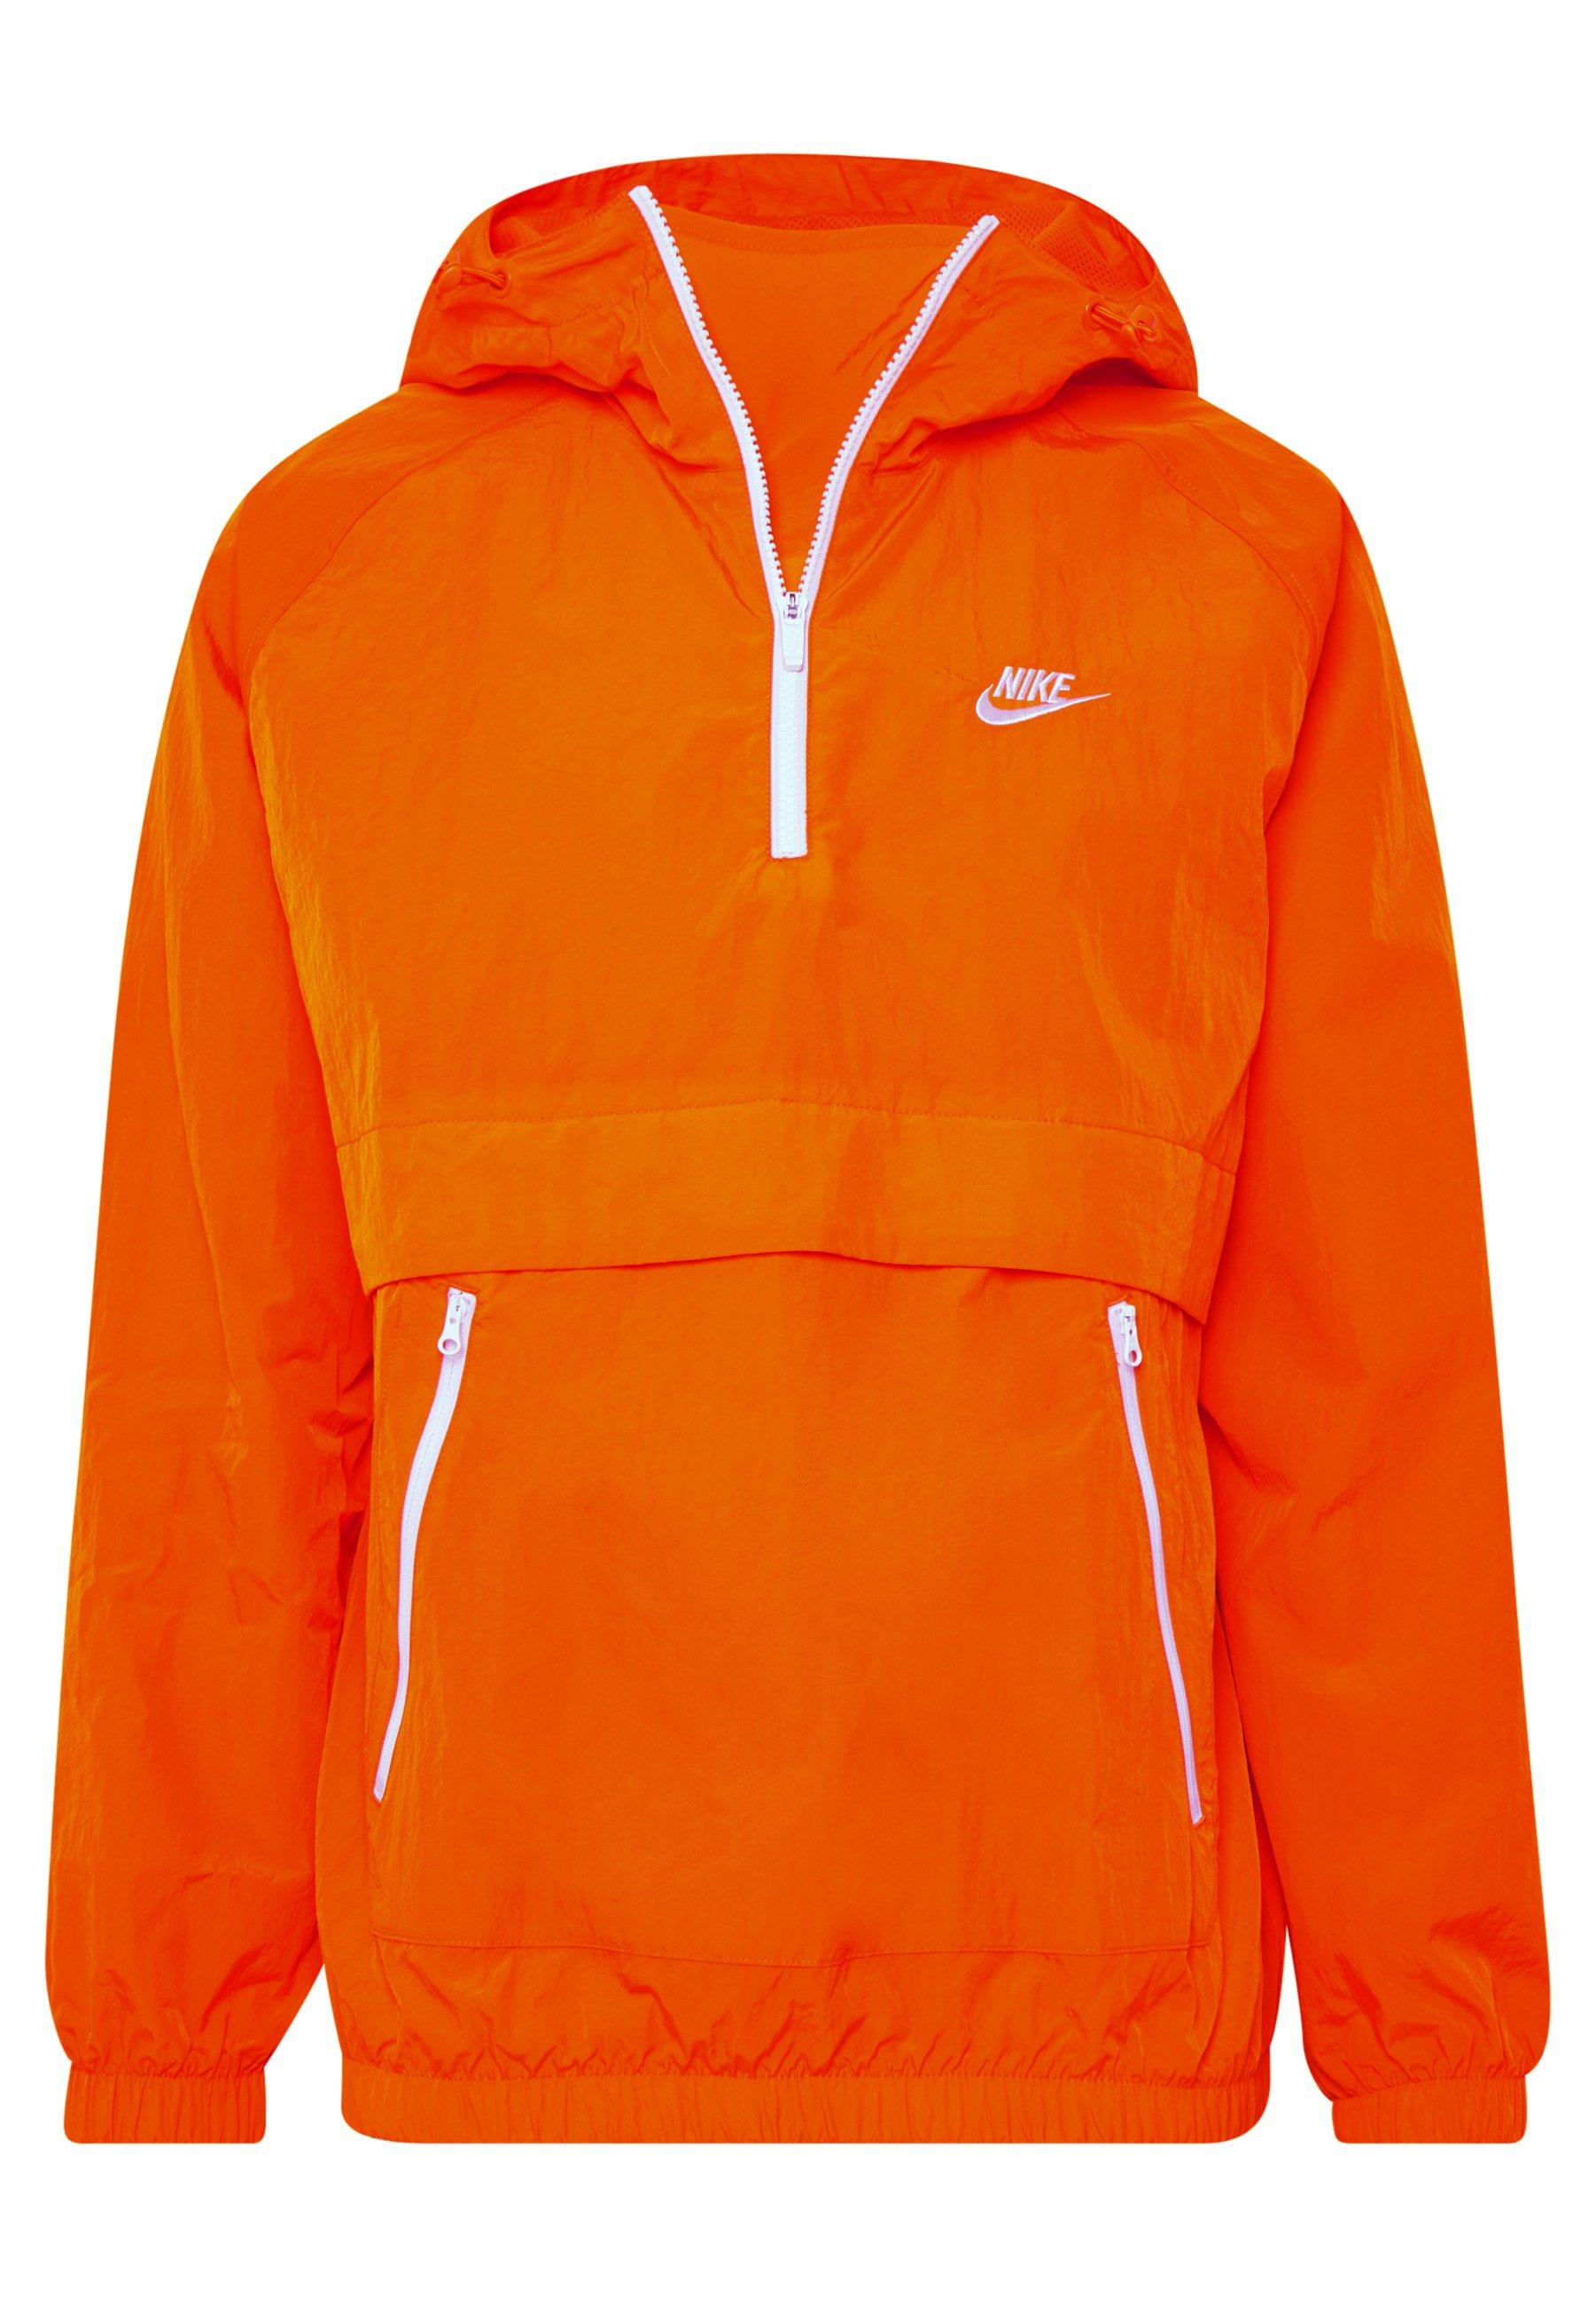 Superbe veste survêtement NIKE homme taille S orange vif